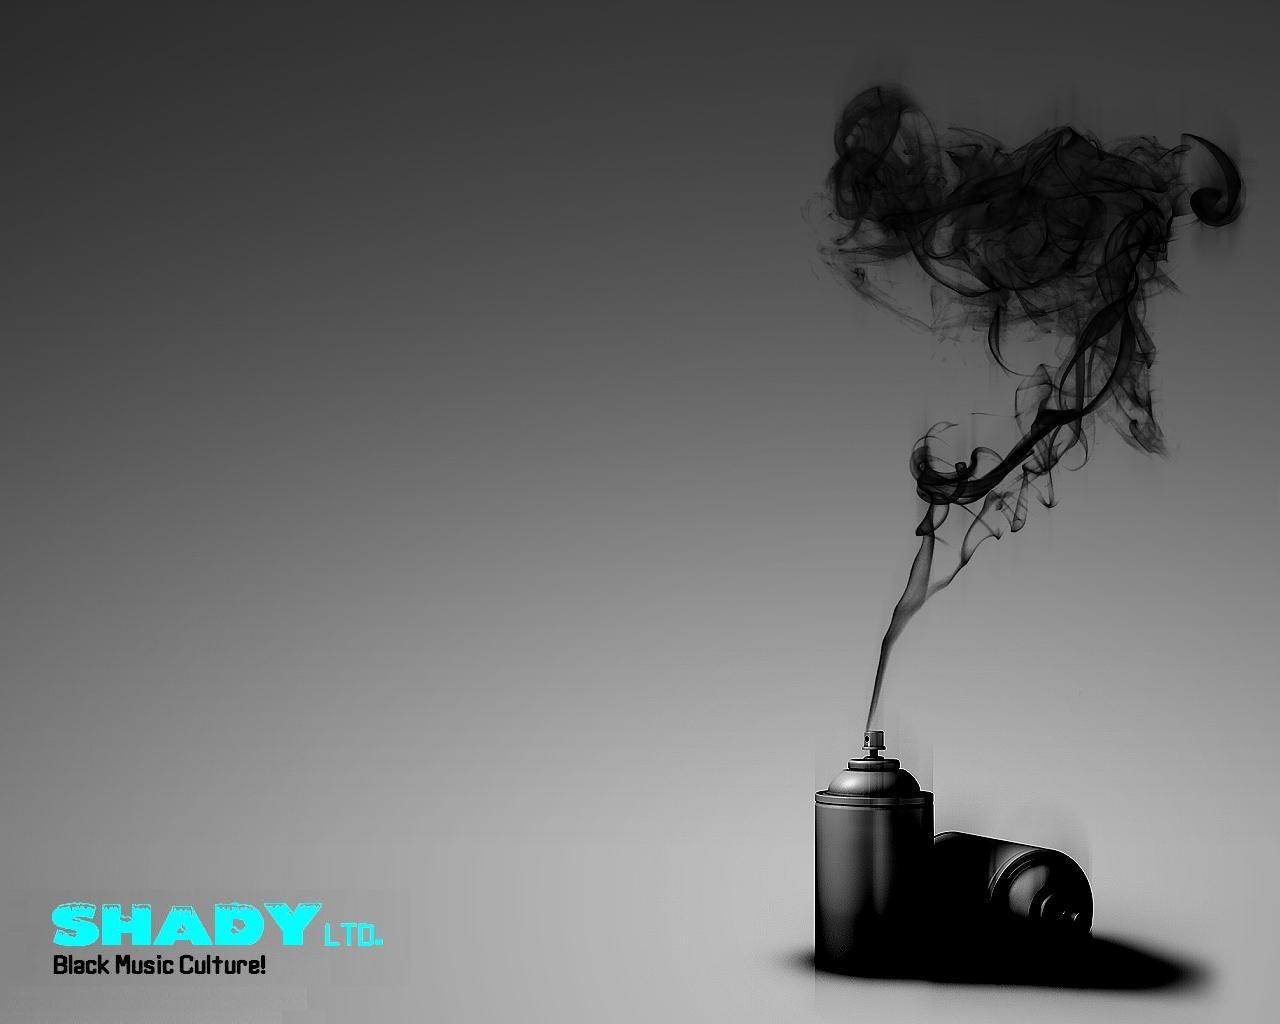 Hip Hop Graffiti Para Descargar Haz Clic Imagen 1280x1024